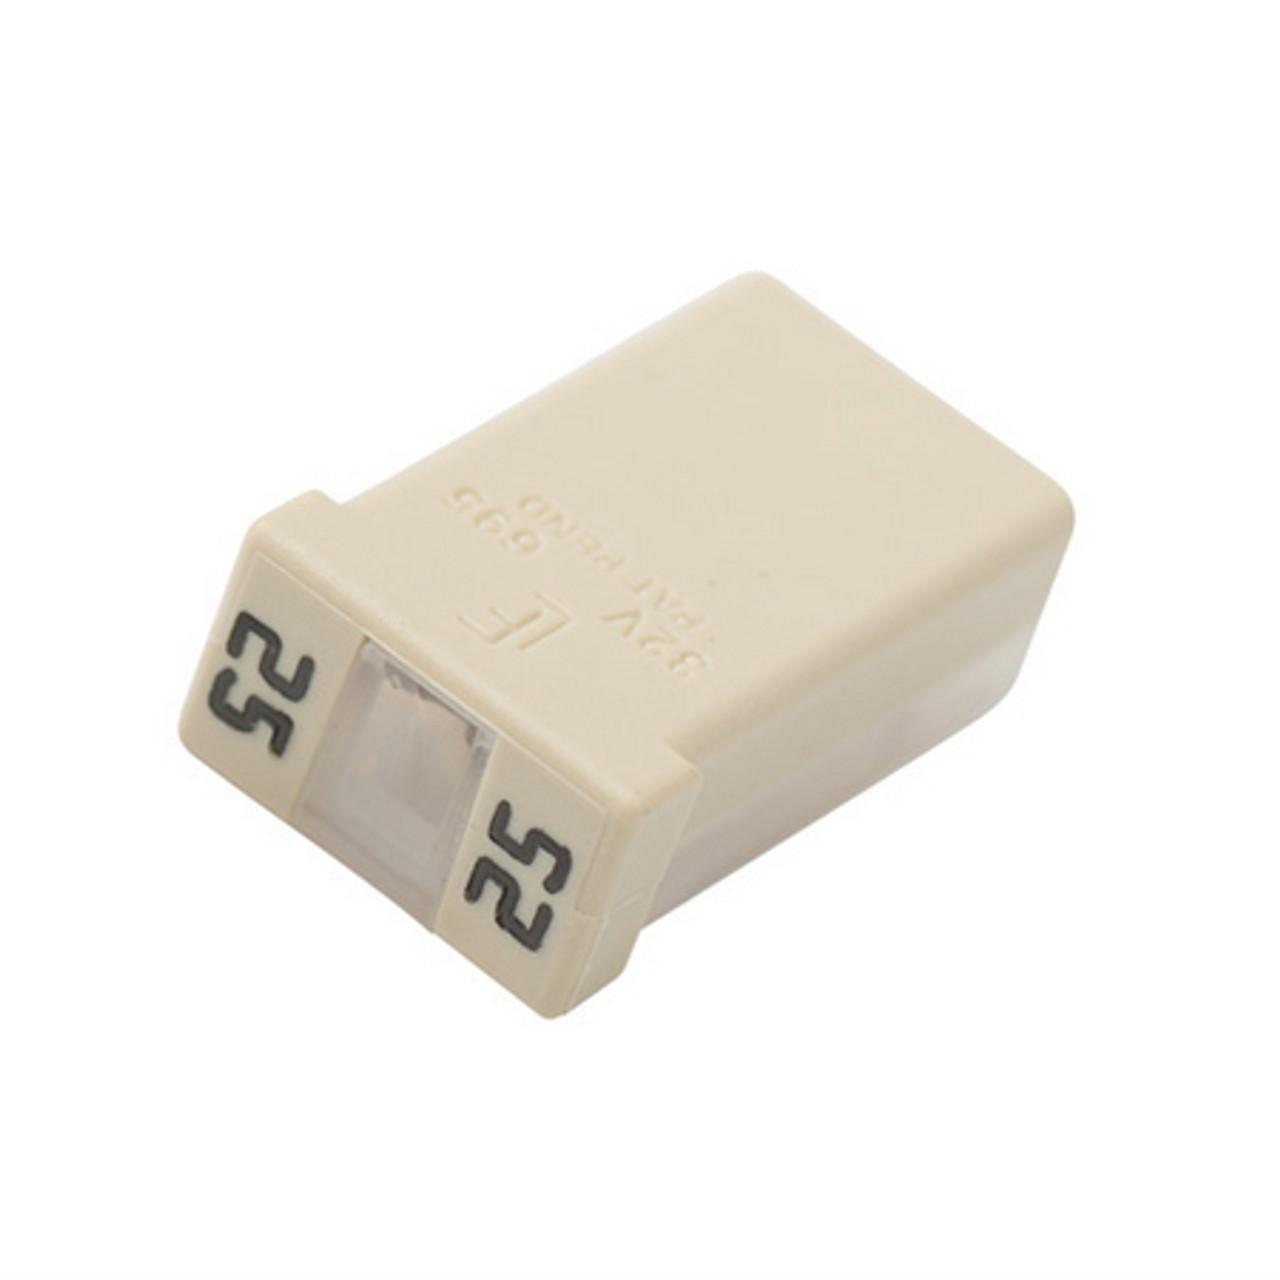 MCASE25 --- 25 Amp MCASE Cartridge Fuse